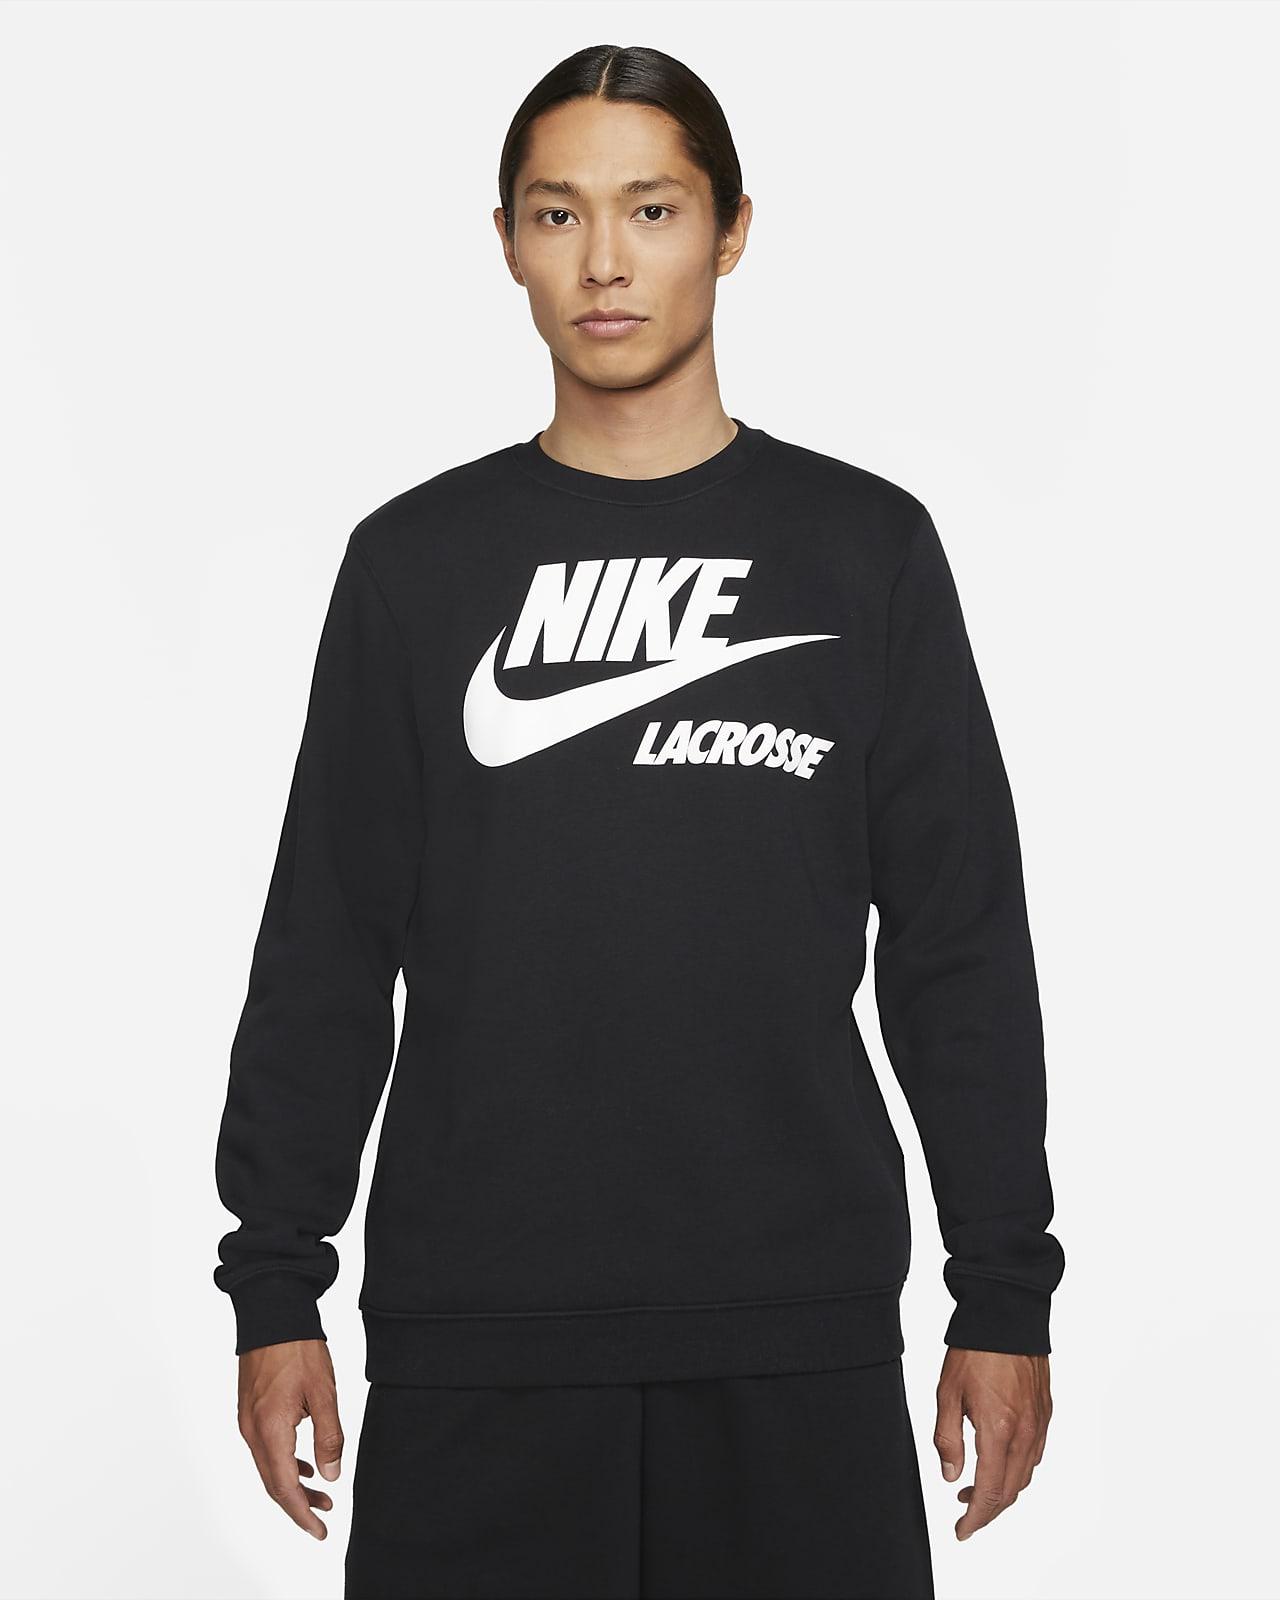 Nike Club Men's Lacrosse Crew